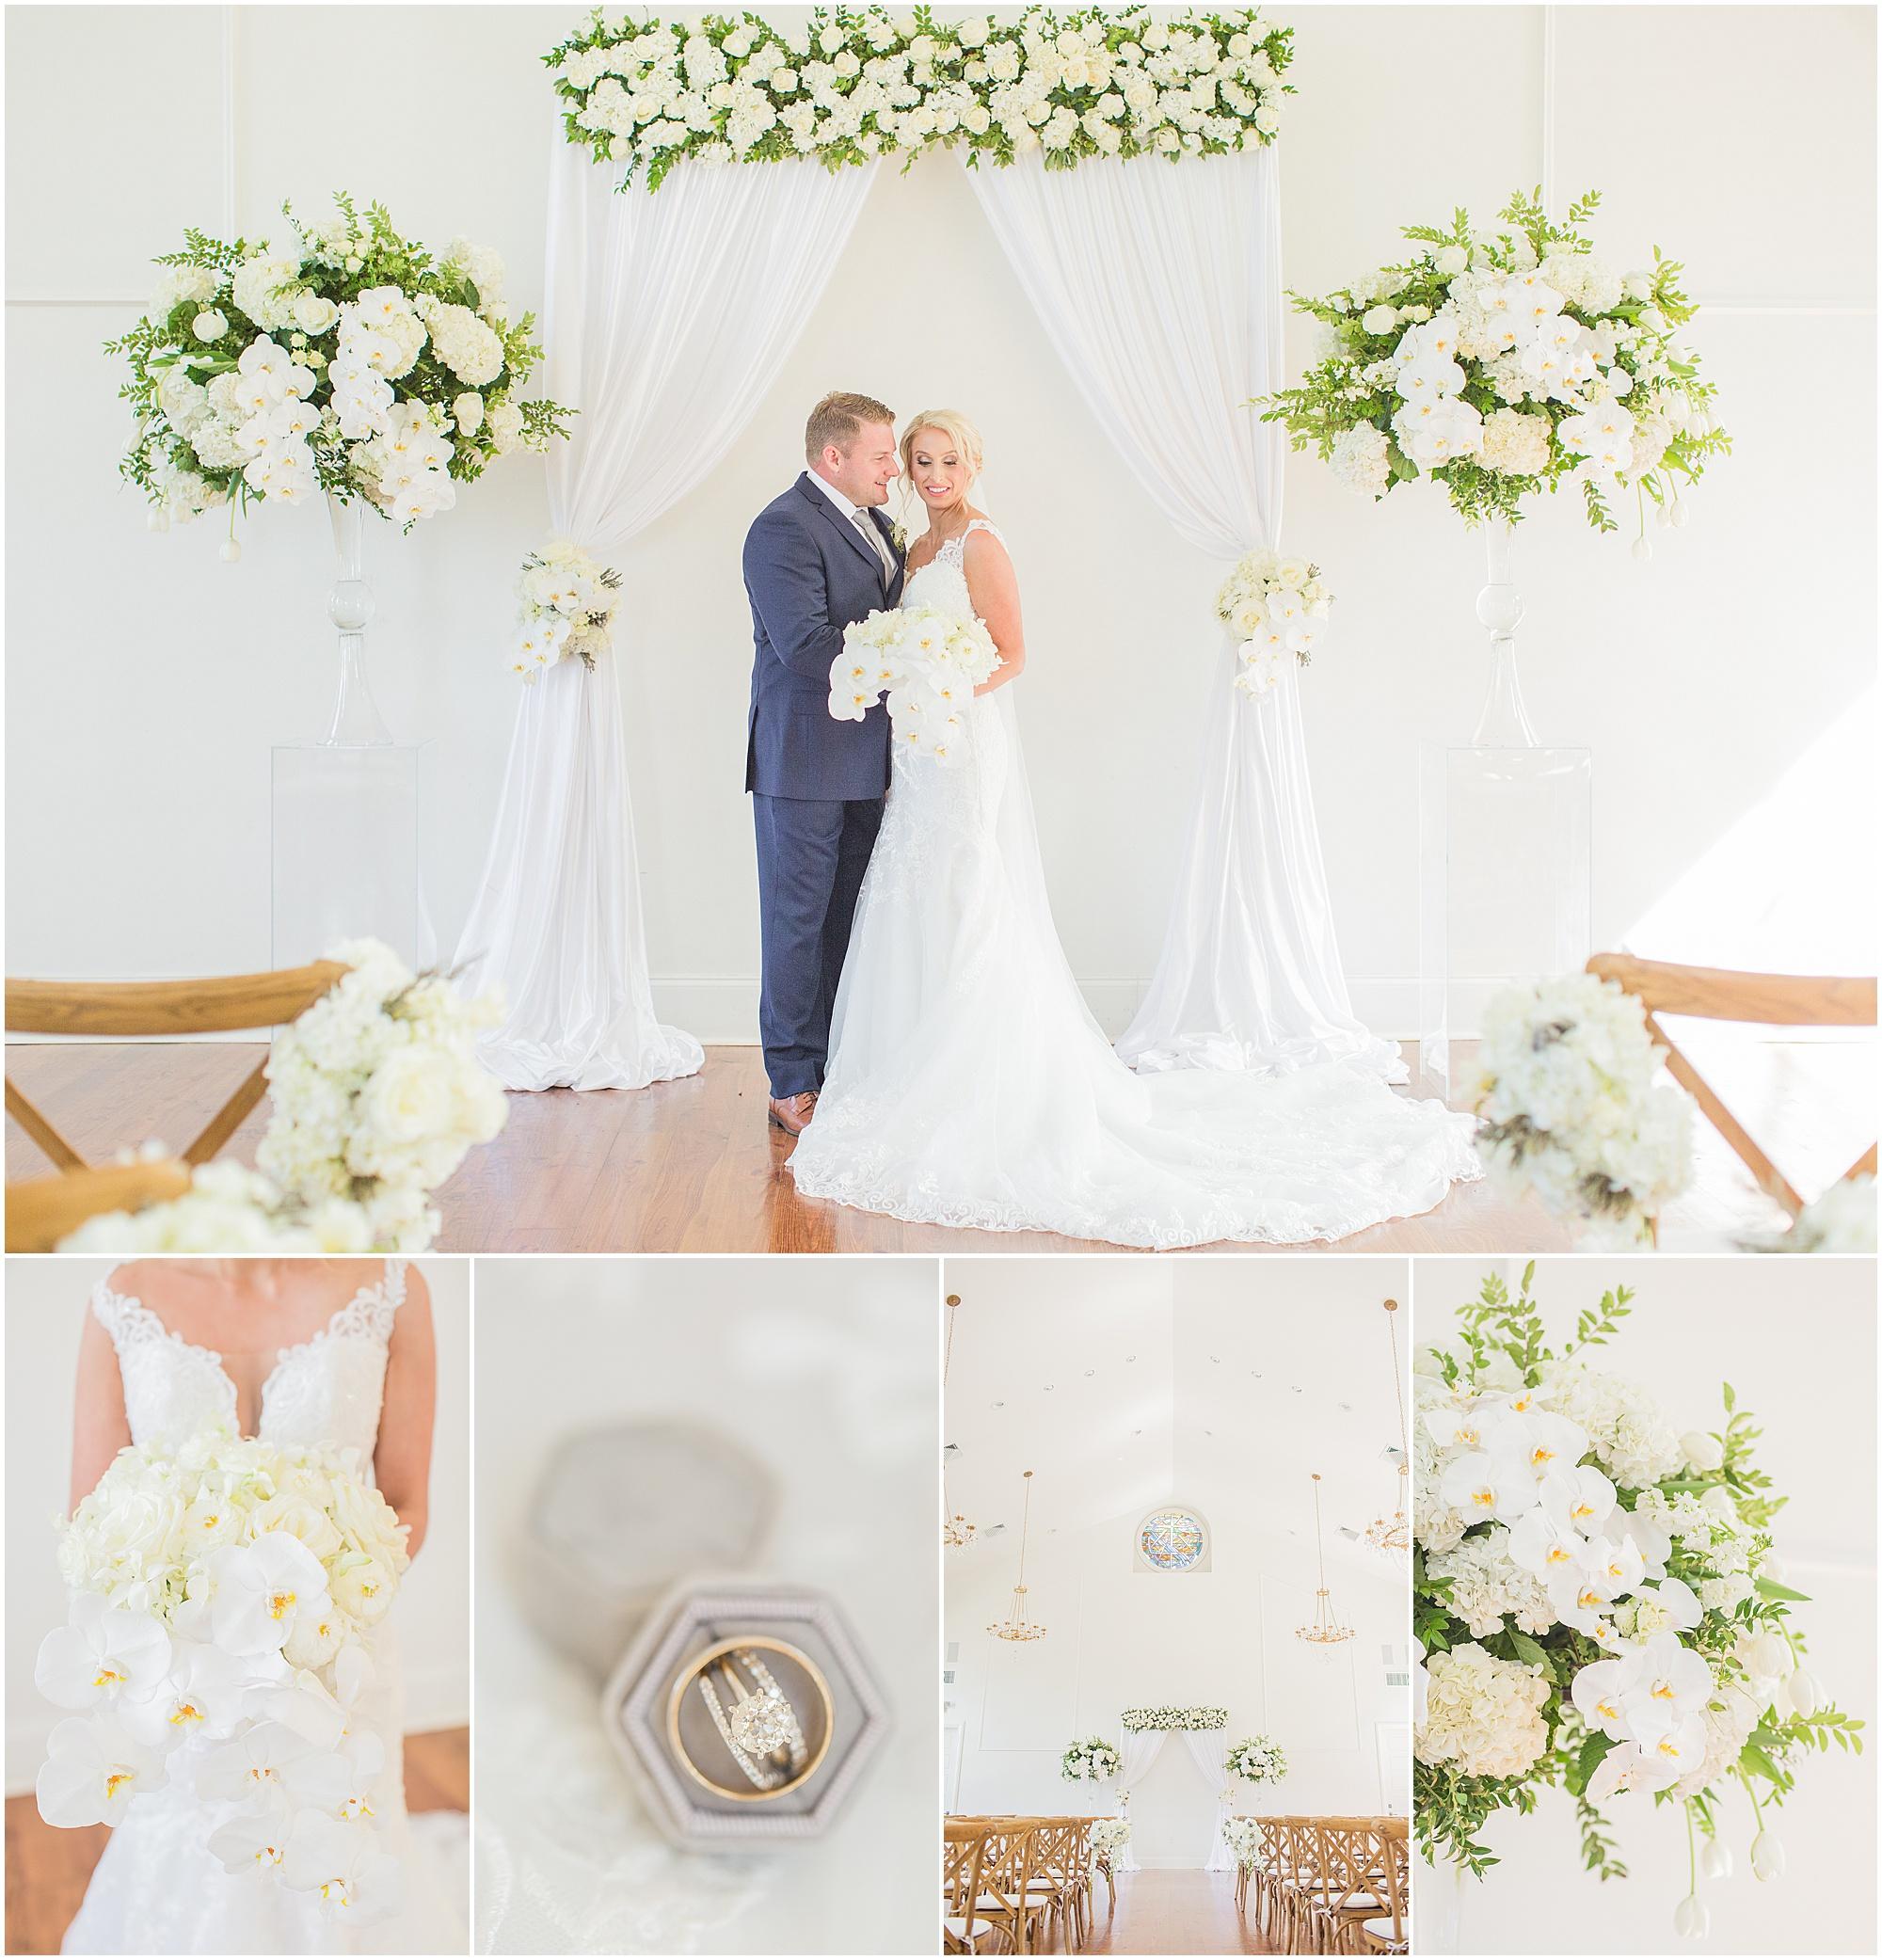 mississippi-wedding-chapel-at-livingston_0001.jpg